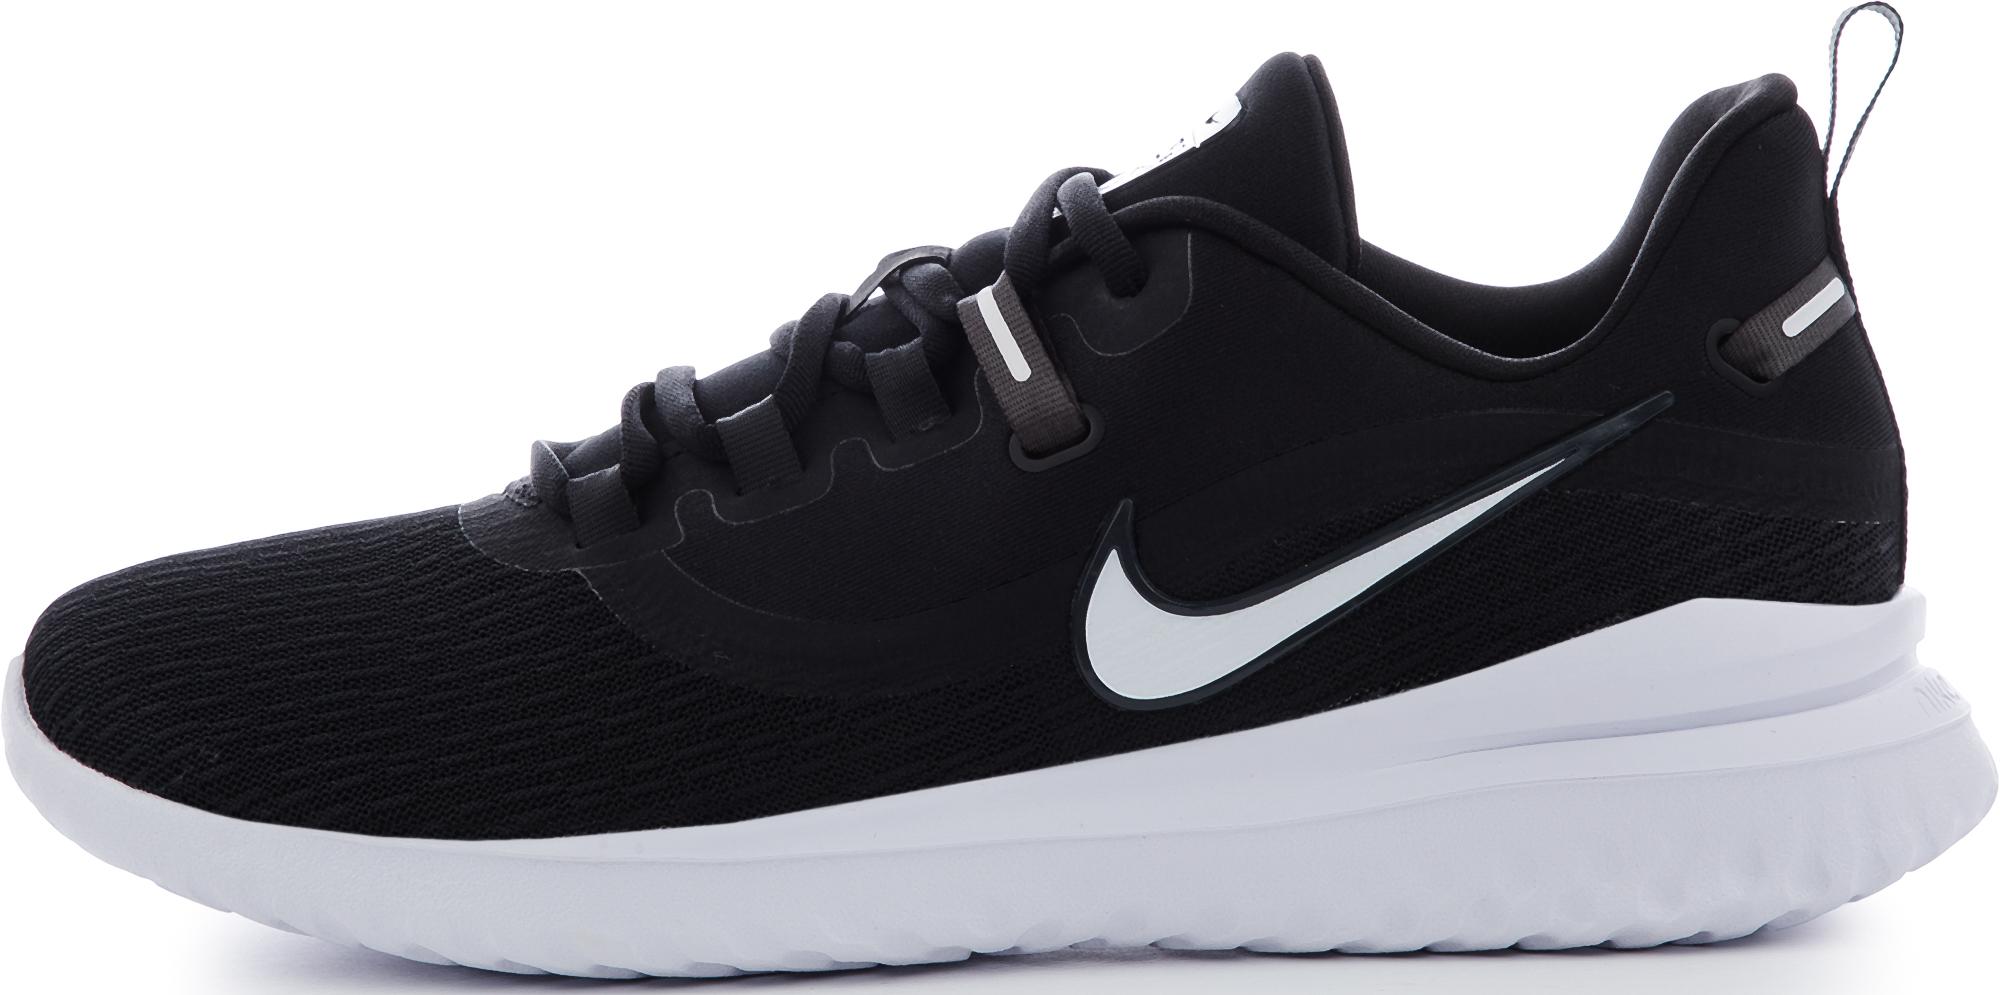 Nike Кроссовки женские Renew Rival 2, размер 40